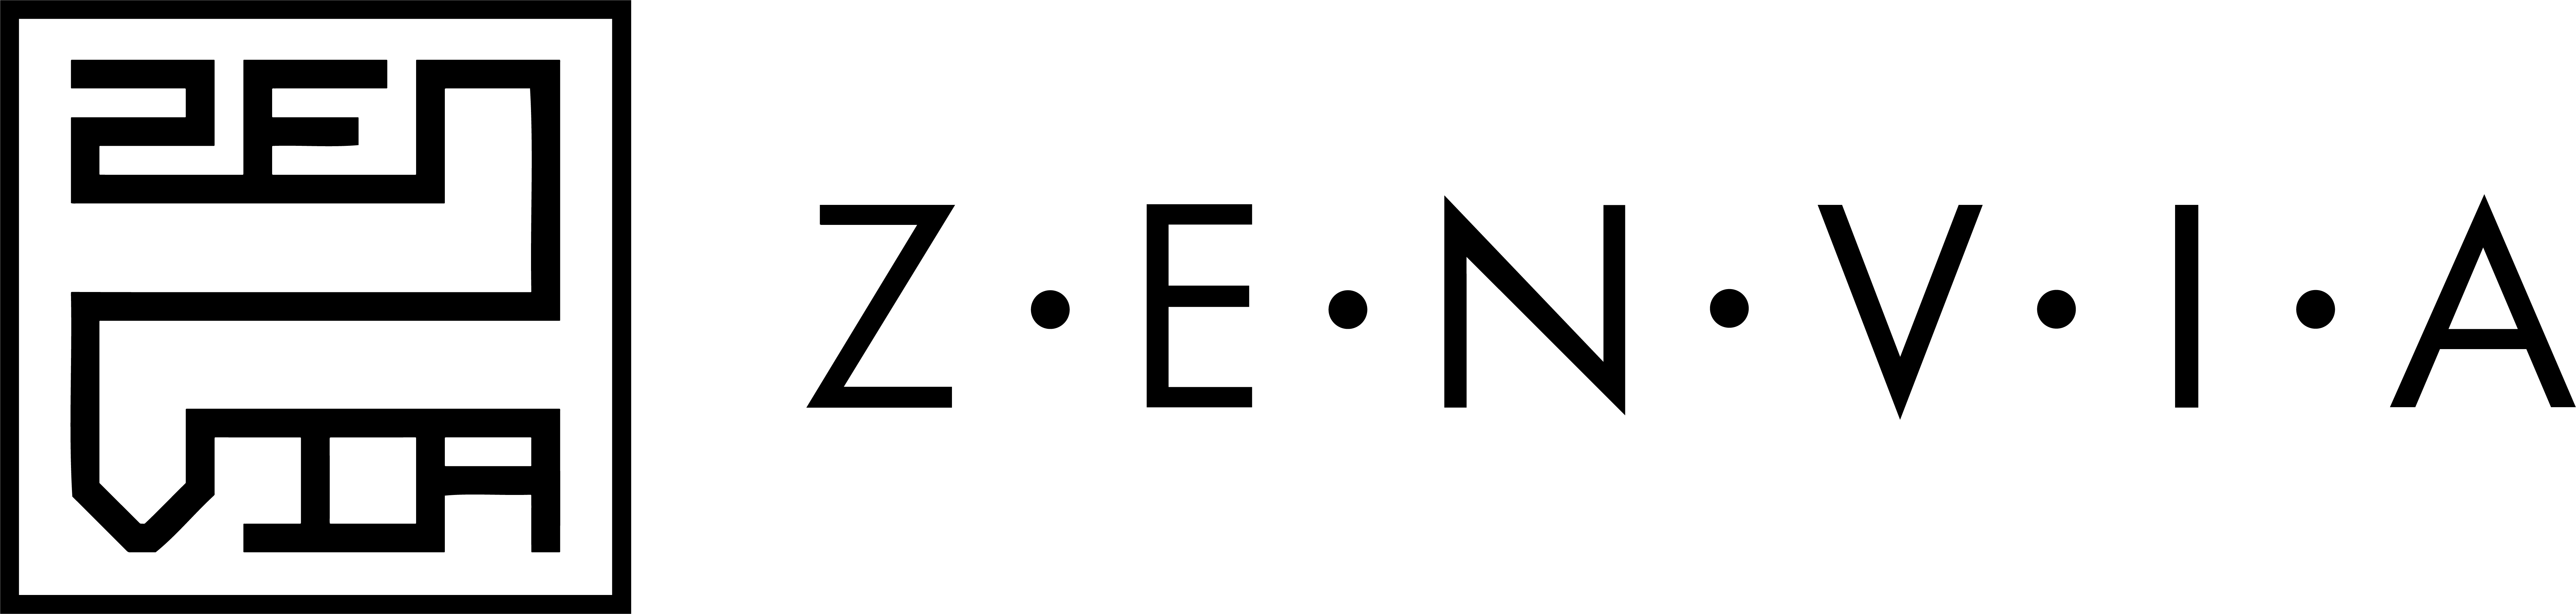 Brandmark zenvia horizontal positivo